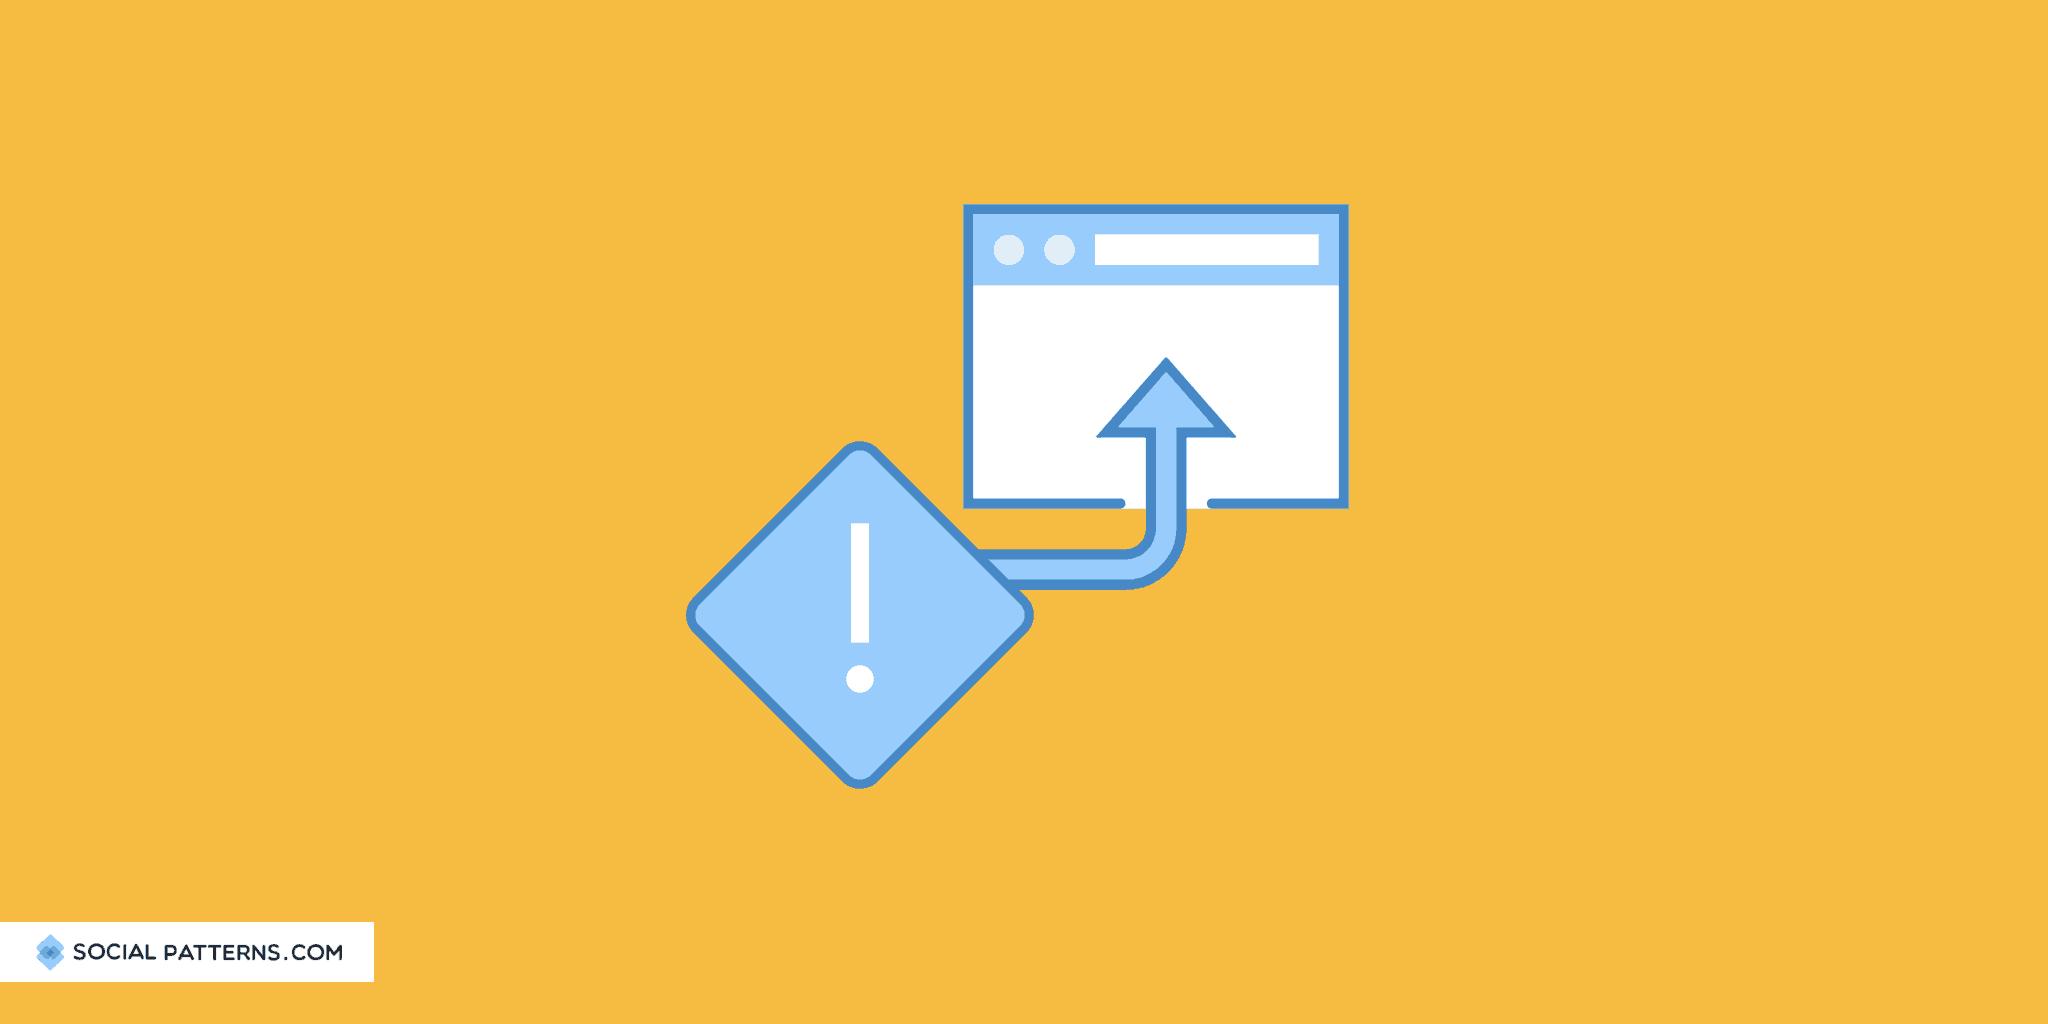 internal anchor text over optimization